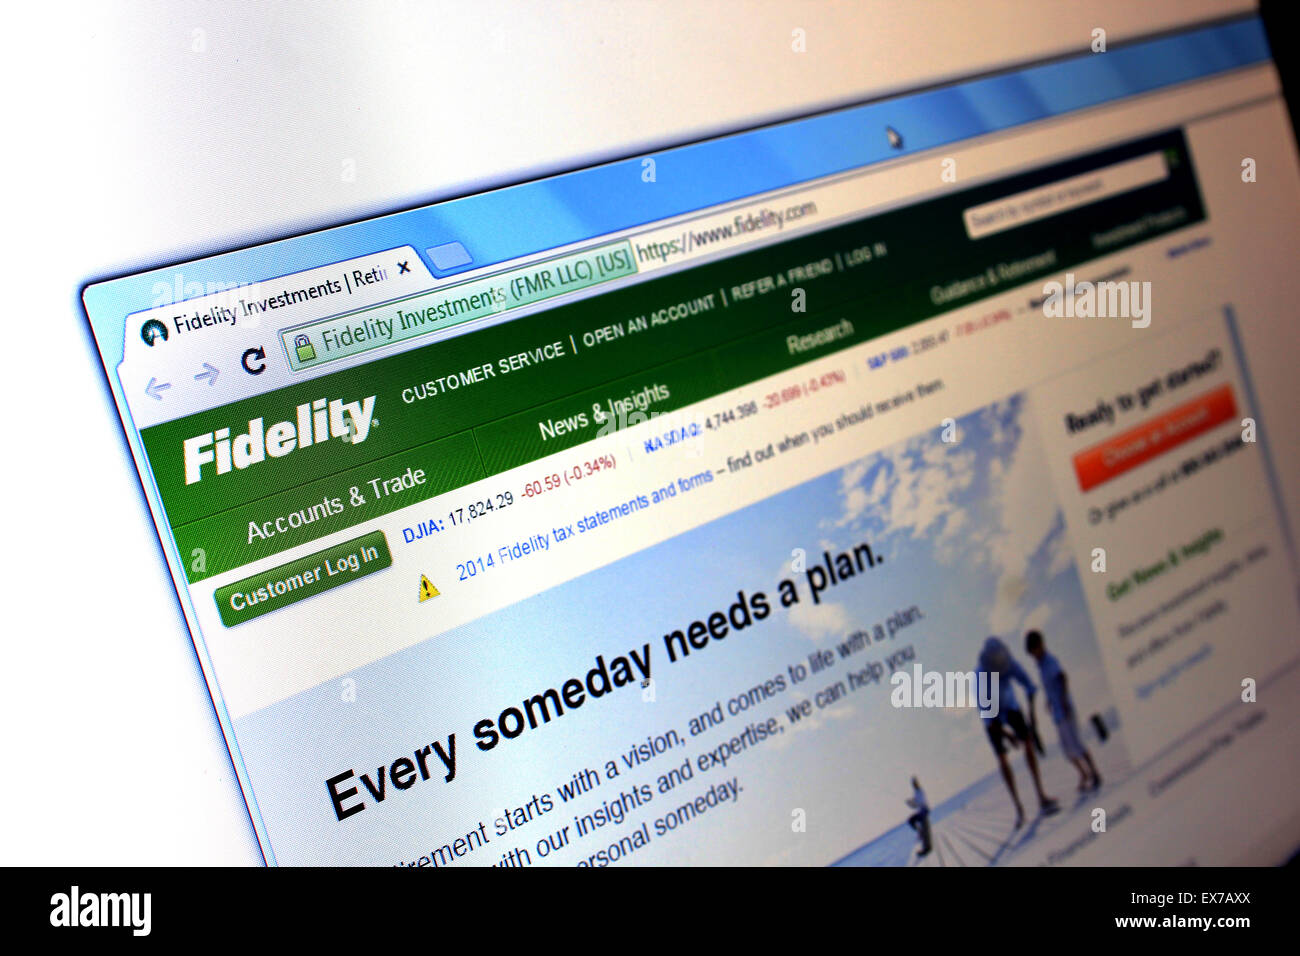 fidelity.com - Stock Image